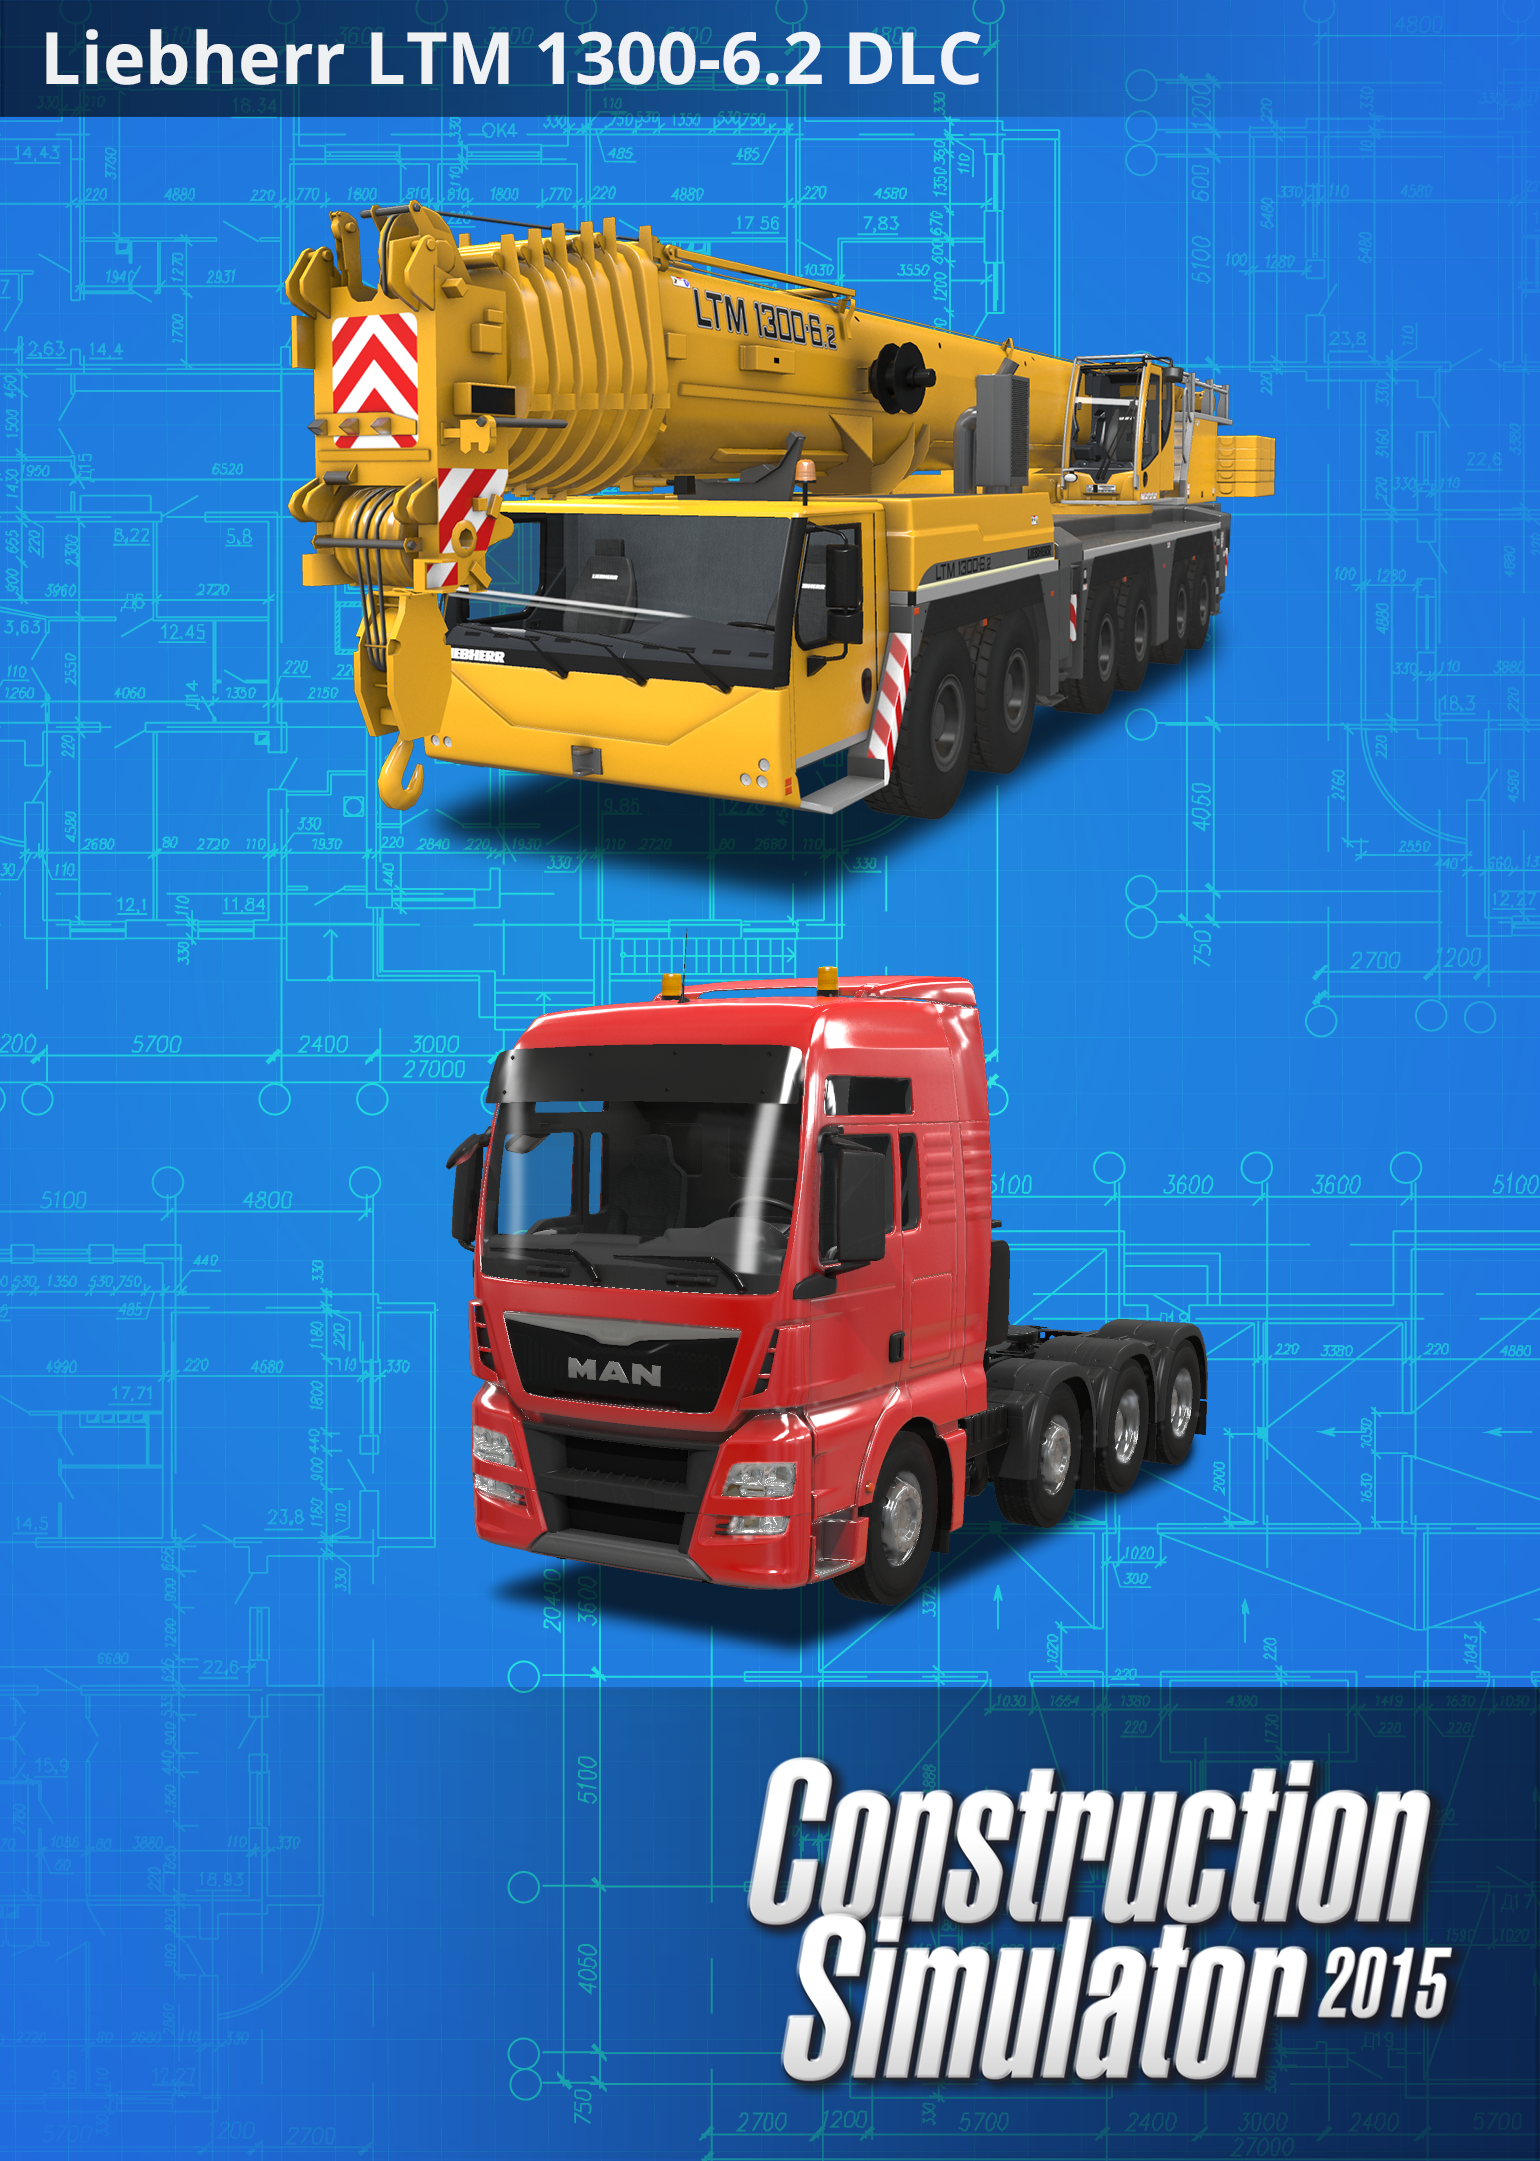 construction-simulator-2015-liebherr-ltm-1300-62-pc-mac-code-steam